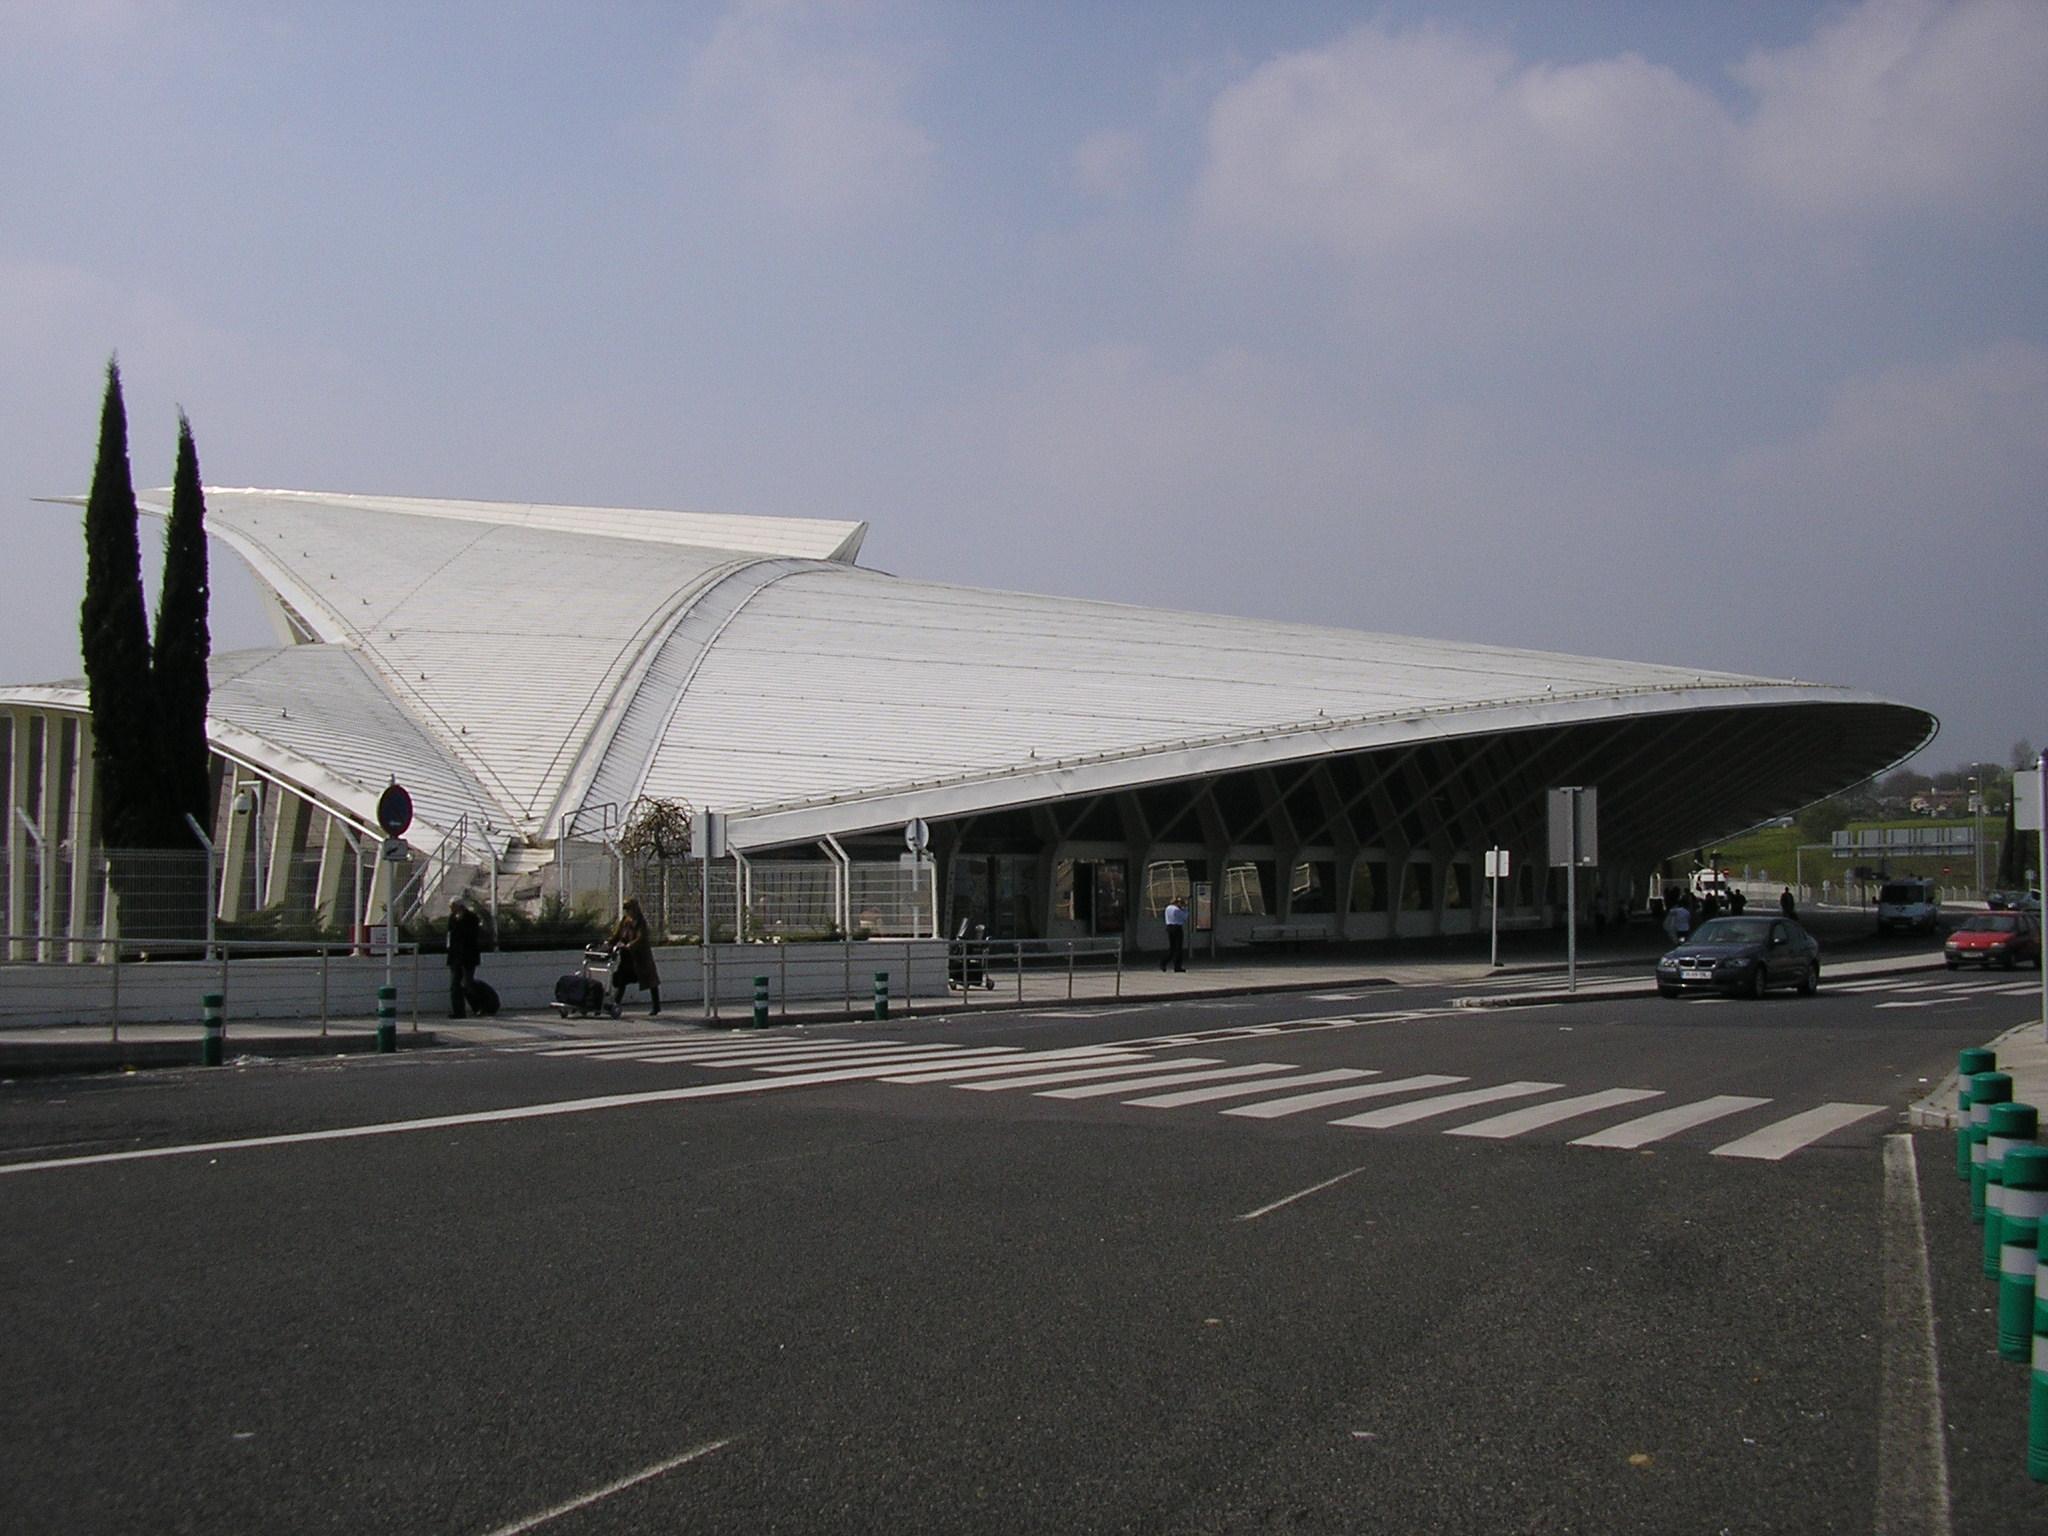 Aeroporto Bilbao : Aeropuerto de bilbao